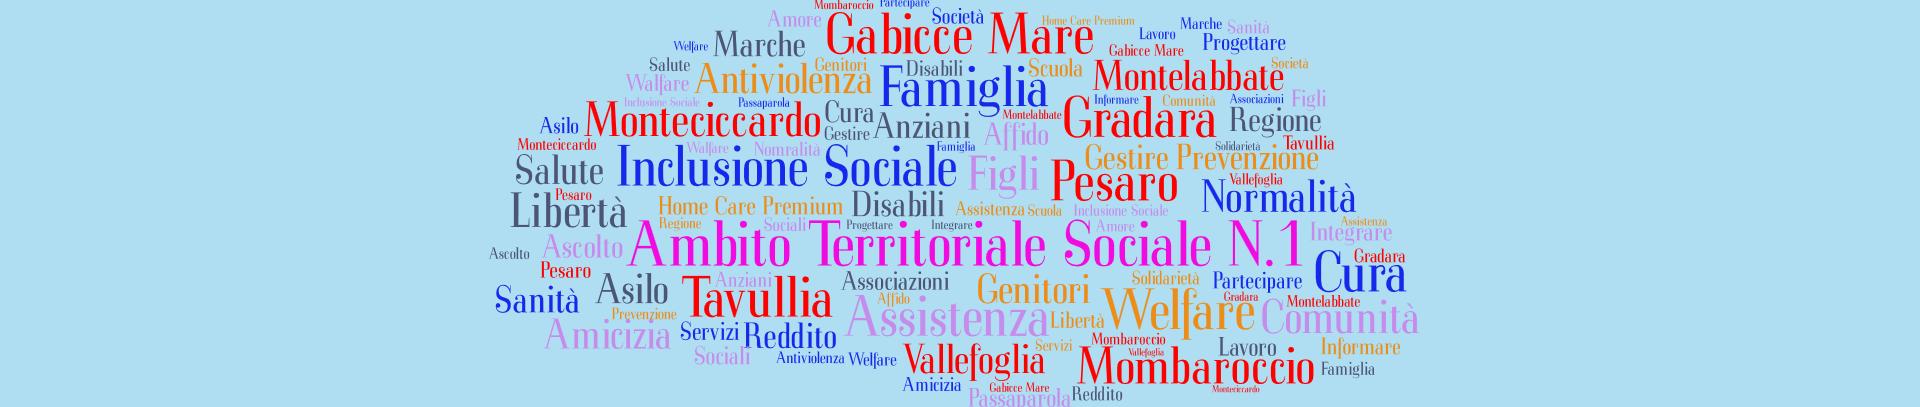 Ambito Territoriale Sociale n.1